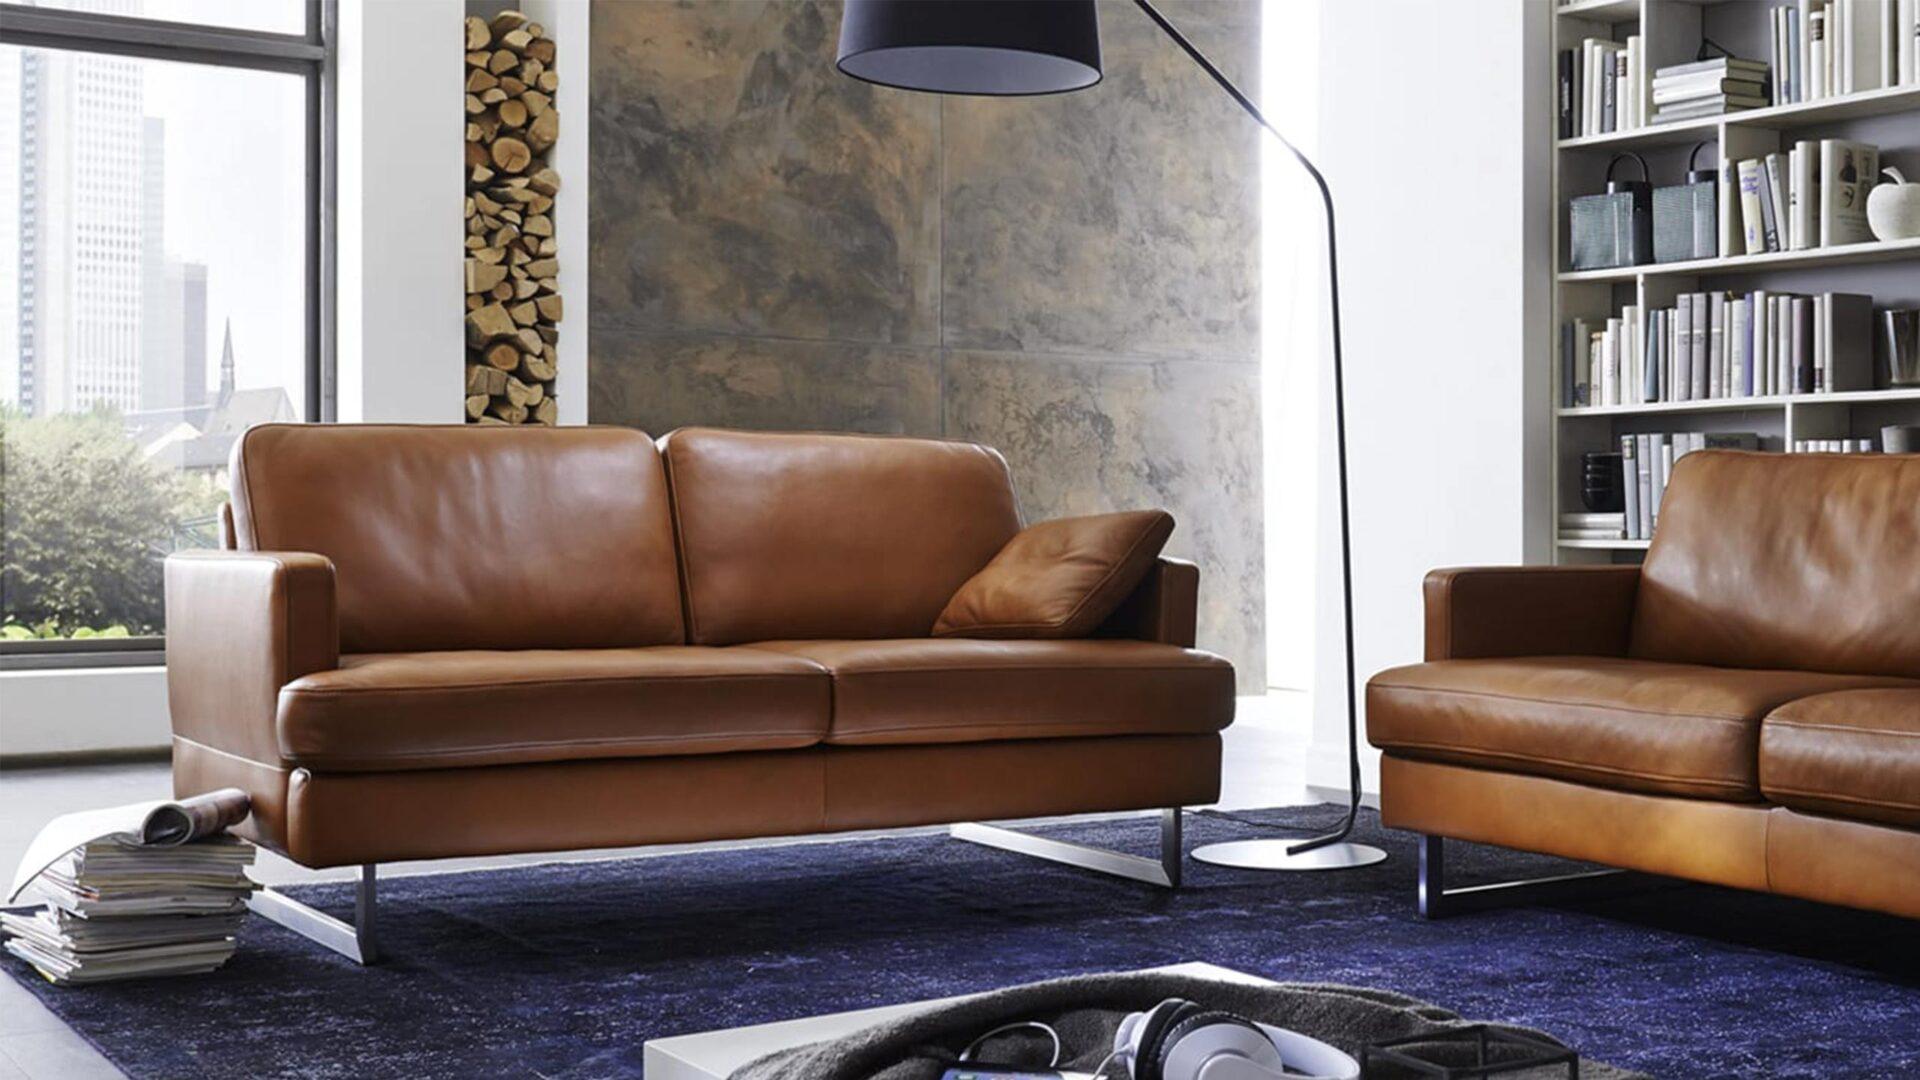 Wemafa Sofa